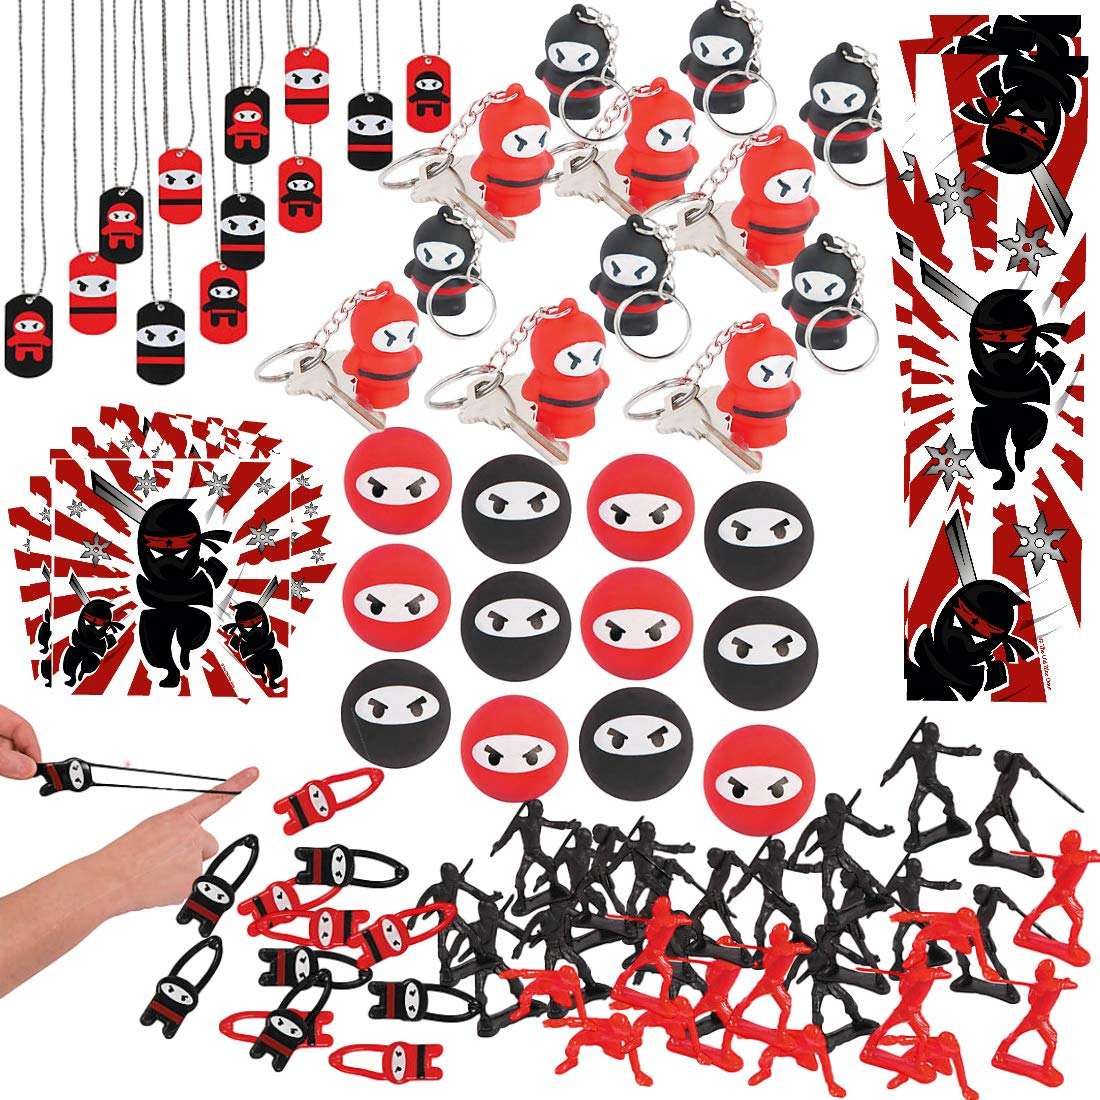 Ninja Samurai Birthday Party Favors For Kids 132 Pieces Bulk Ninja Samurai Party Supplies Keychains Action Figurines Bouncy Balls Bookmarks